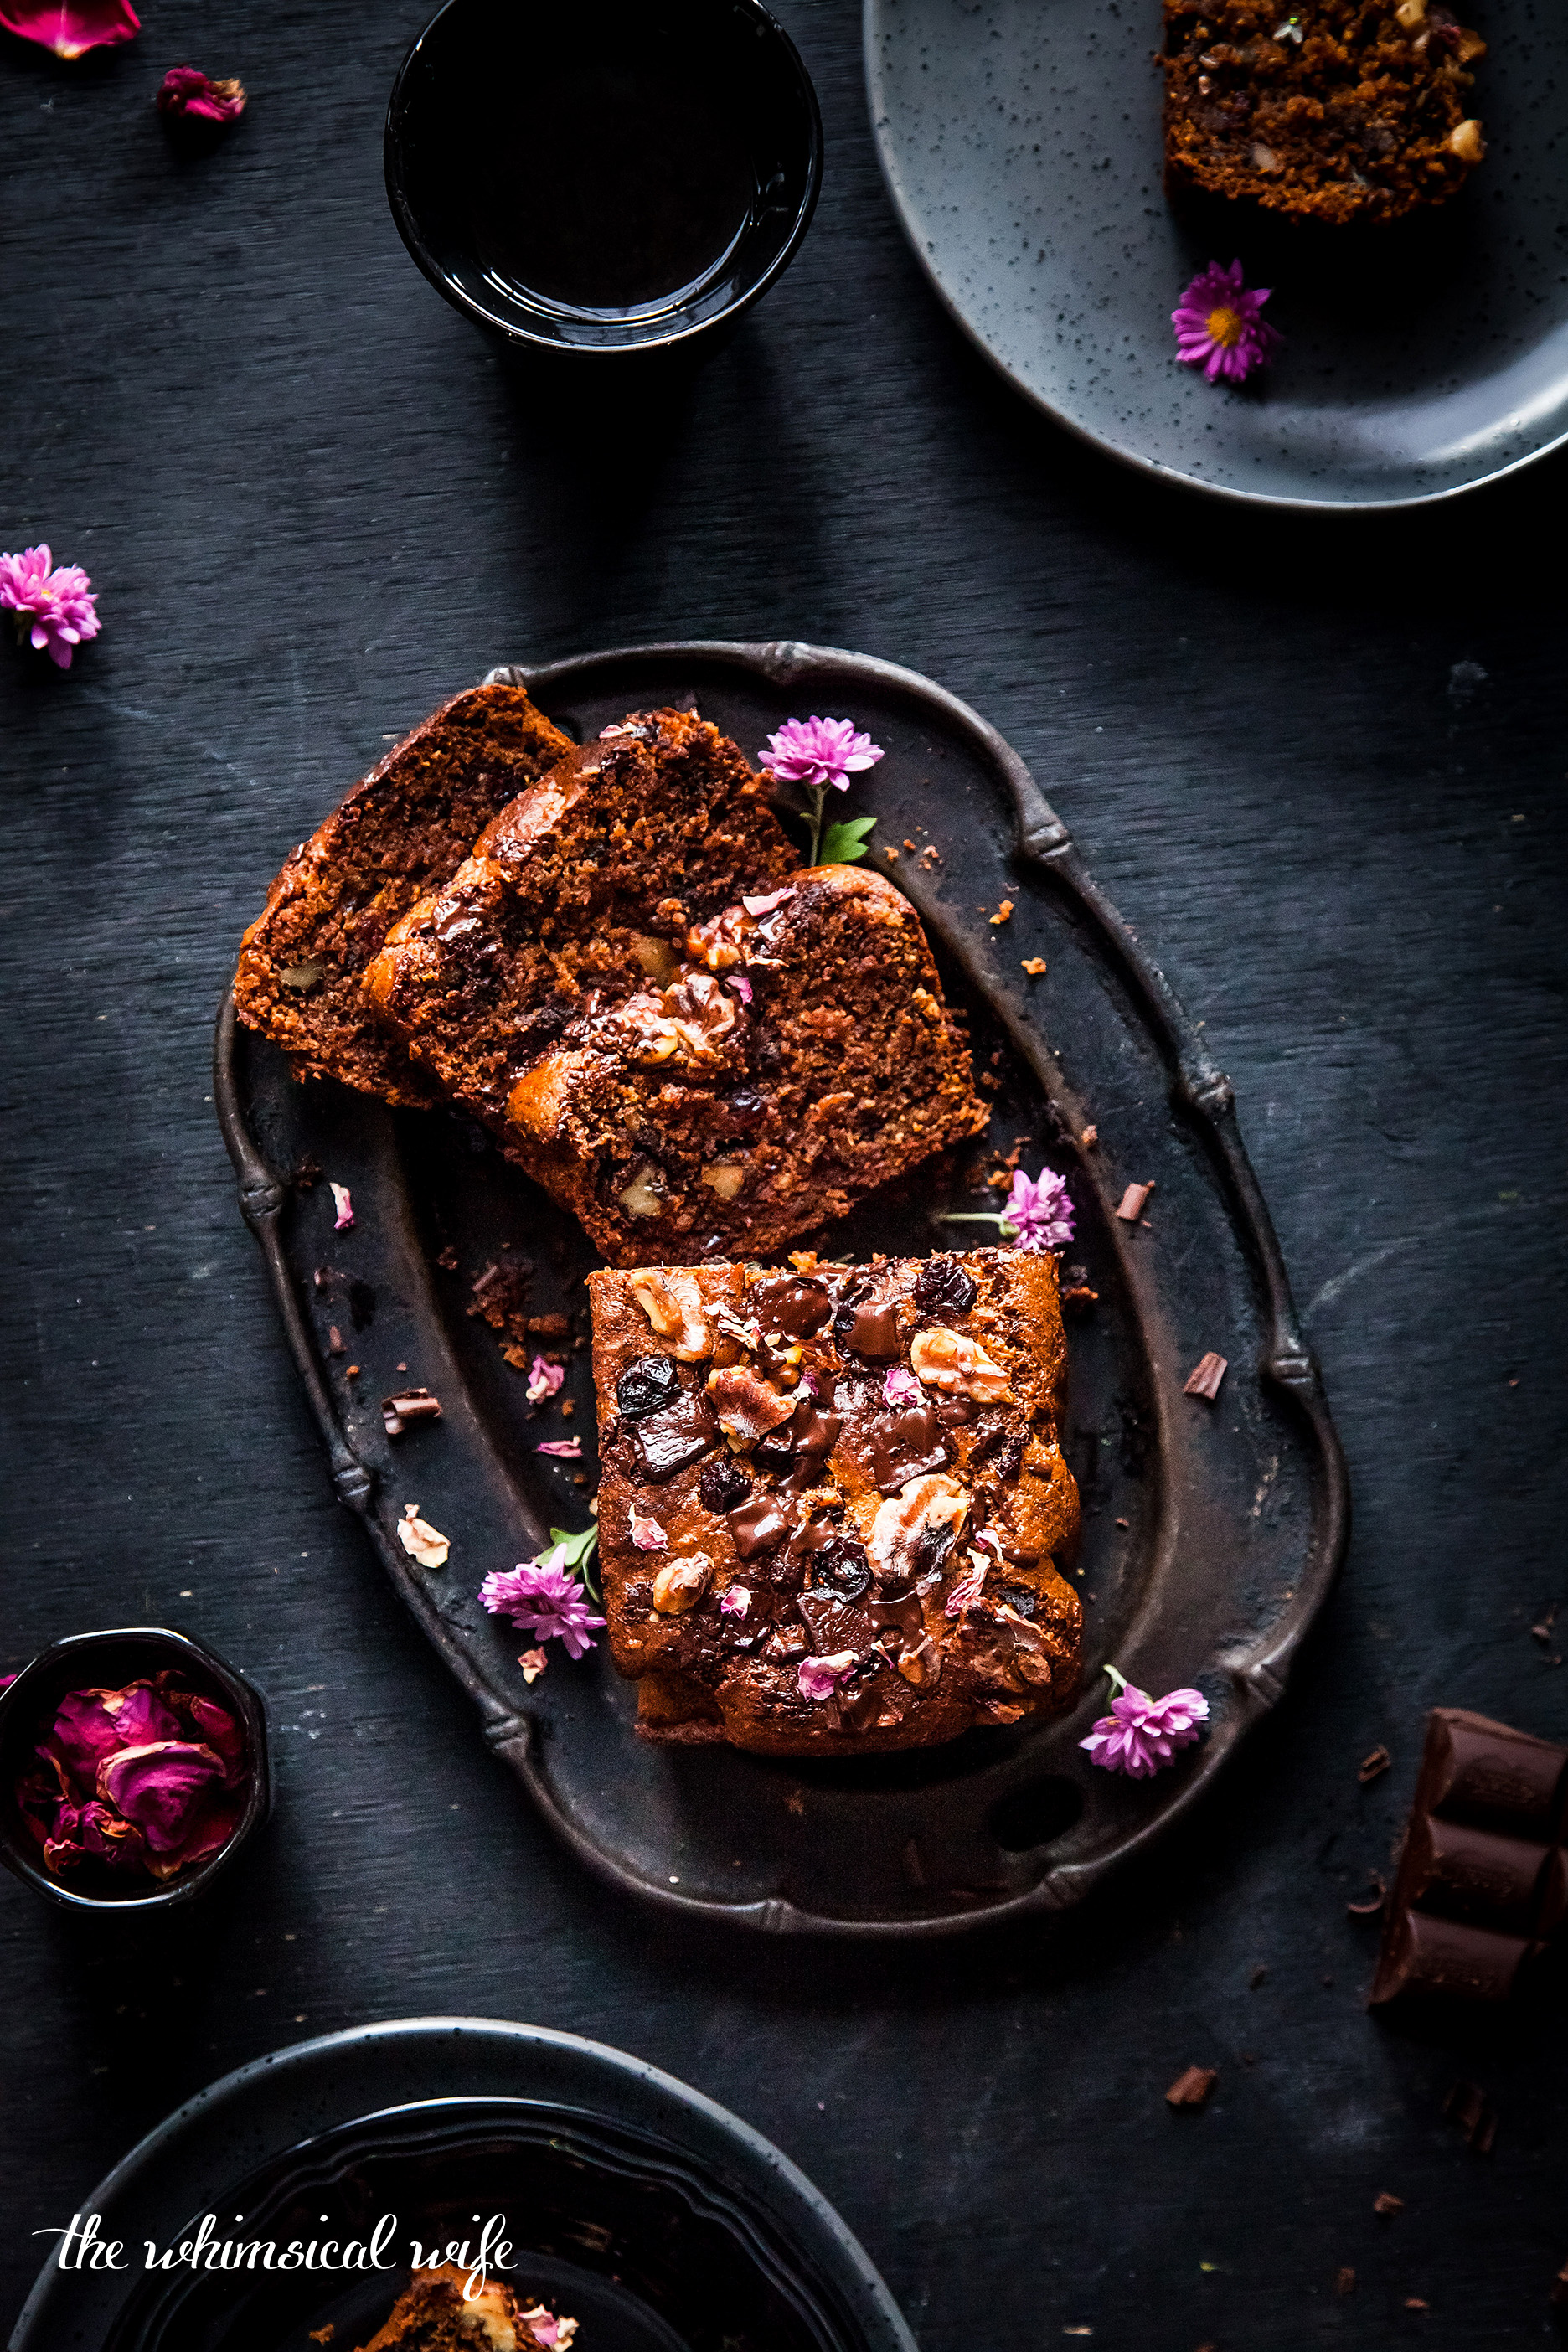 30 Cakes In 30 Days | 4. Dark Chocolate, Cranberry & Walnut Spiced Pumpkin Bread {GF, DF, Vegan} | The Whimsical Wife